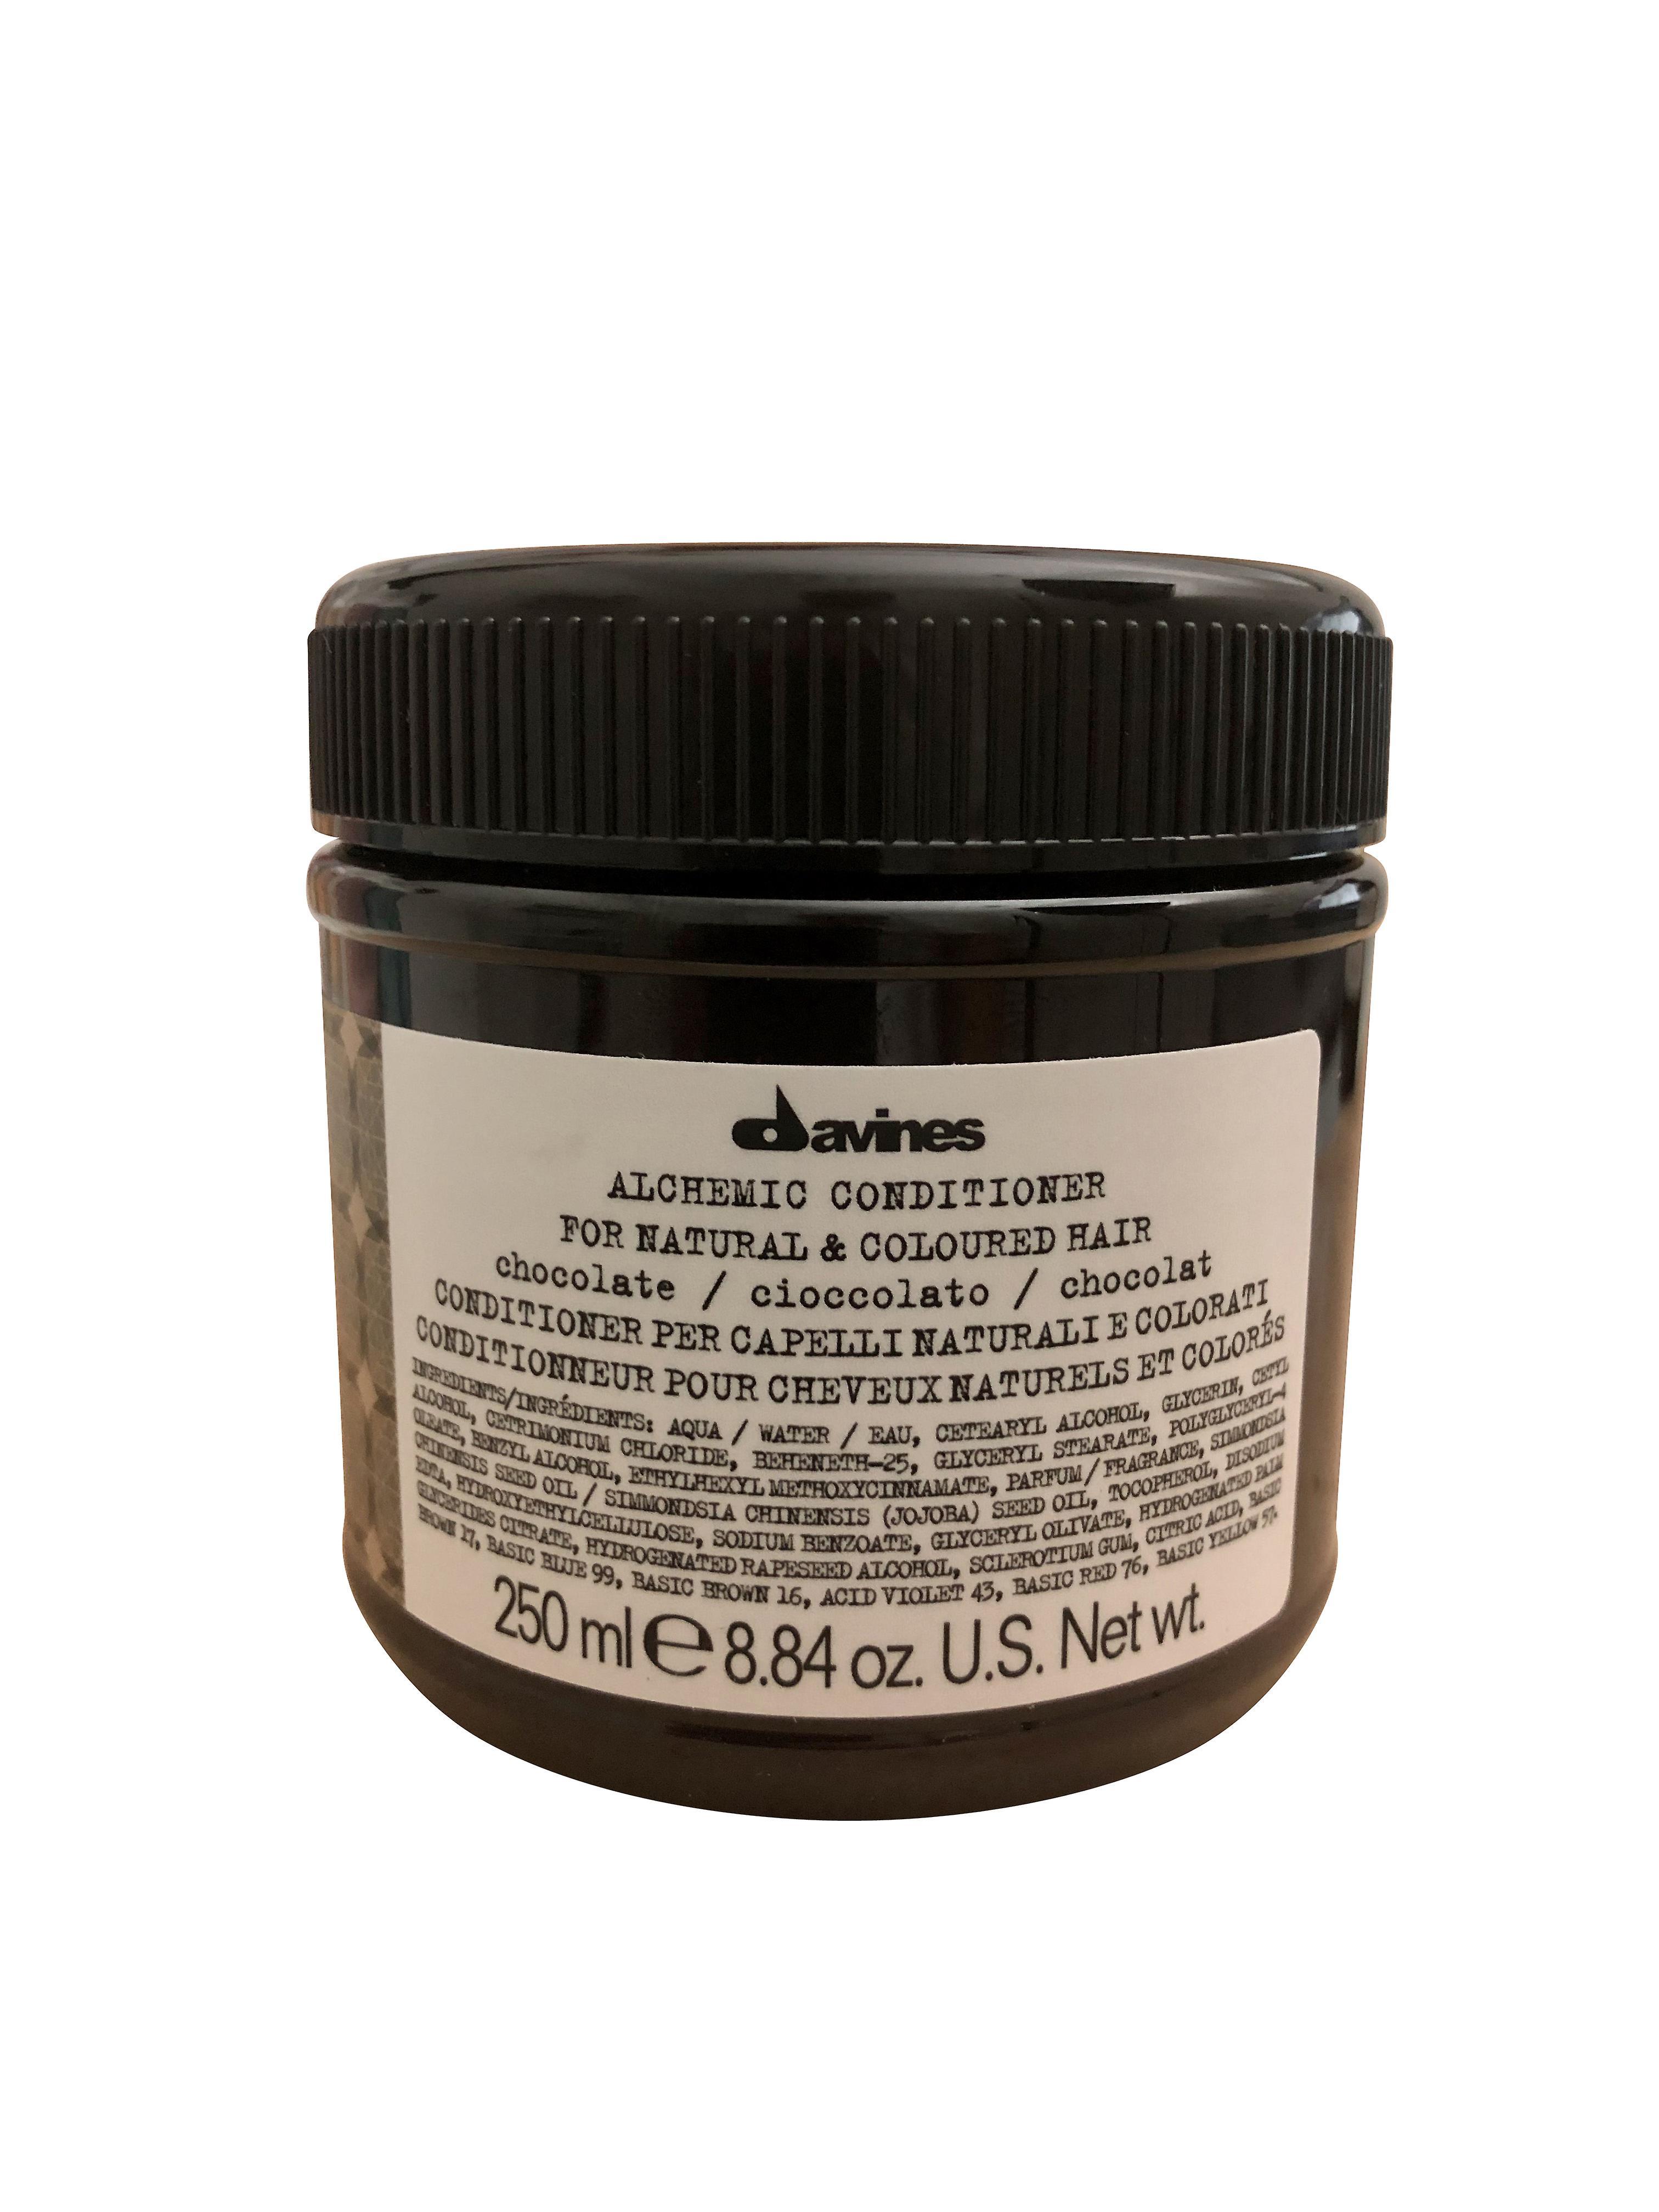 Davines Alchemic Conditioner Chocolate 8.84 OZ